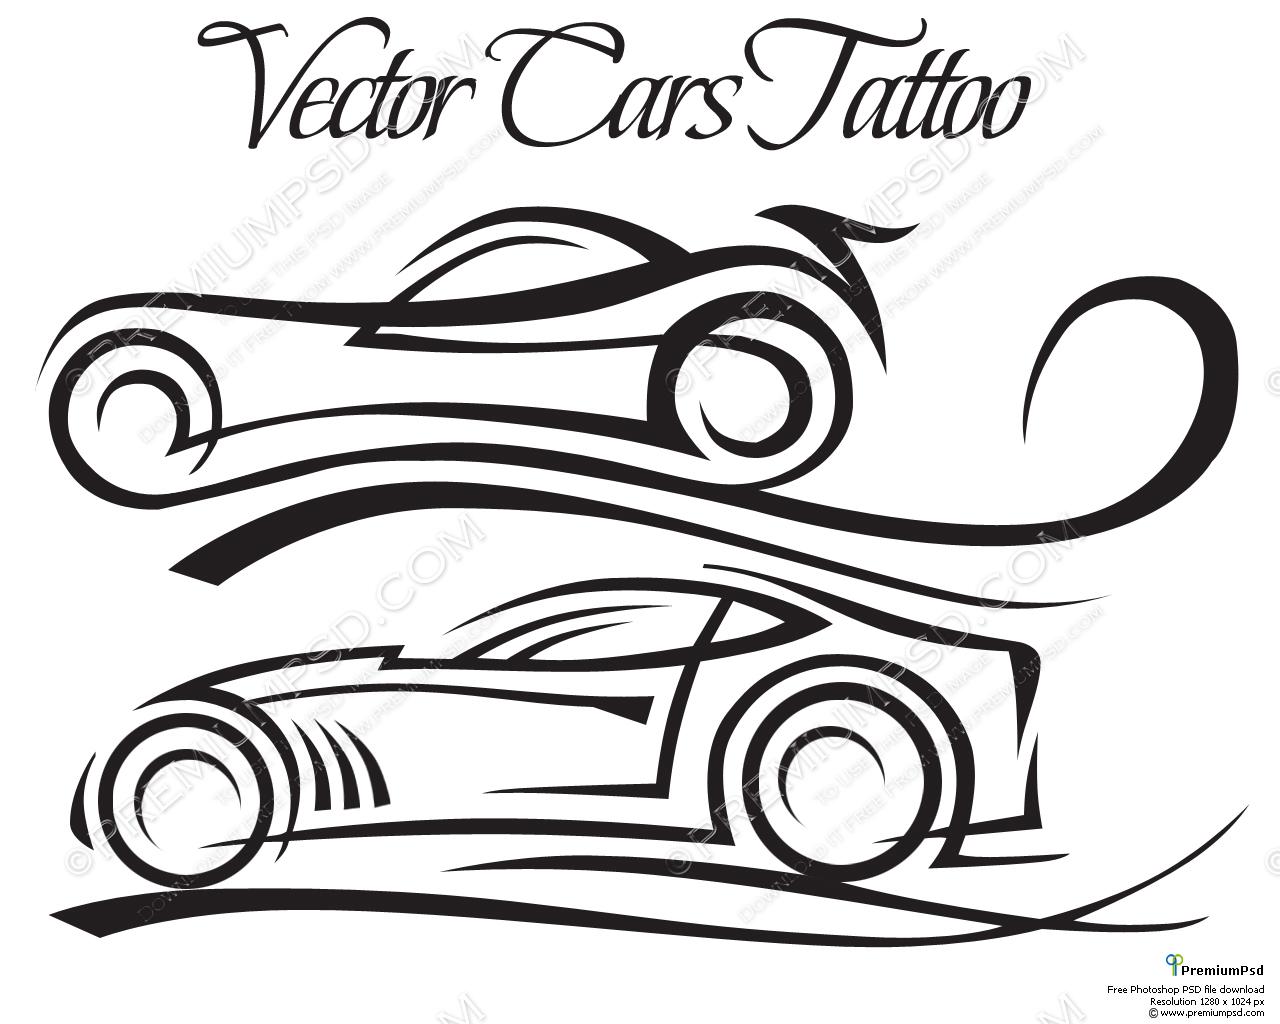 1280x1024 Vector Cars Tattoo